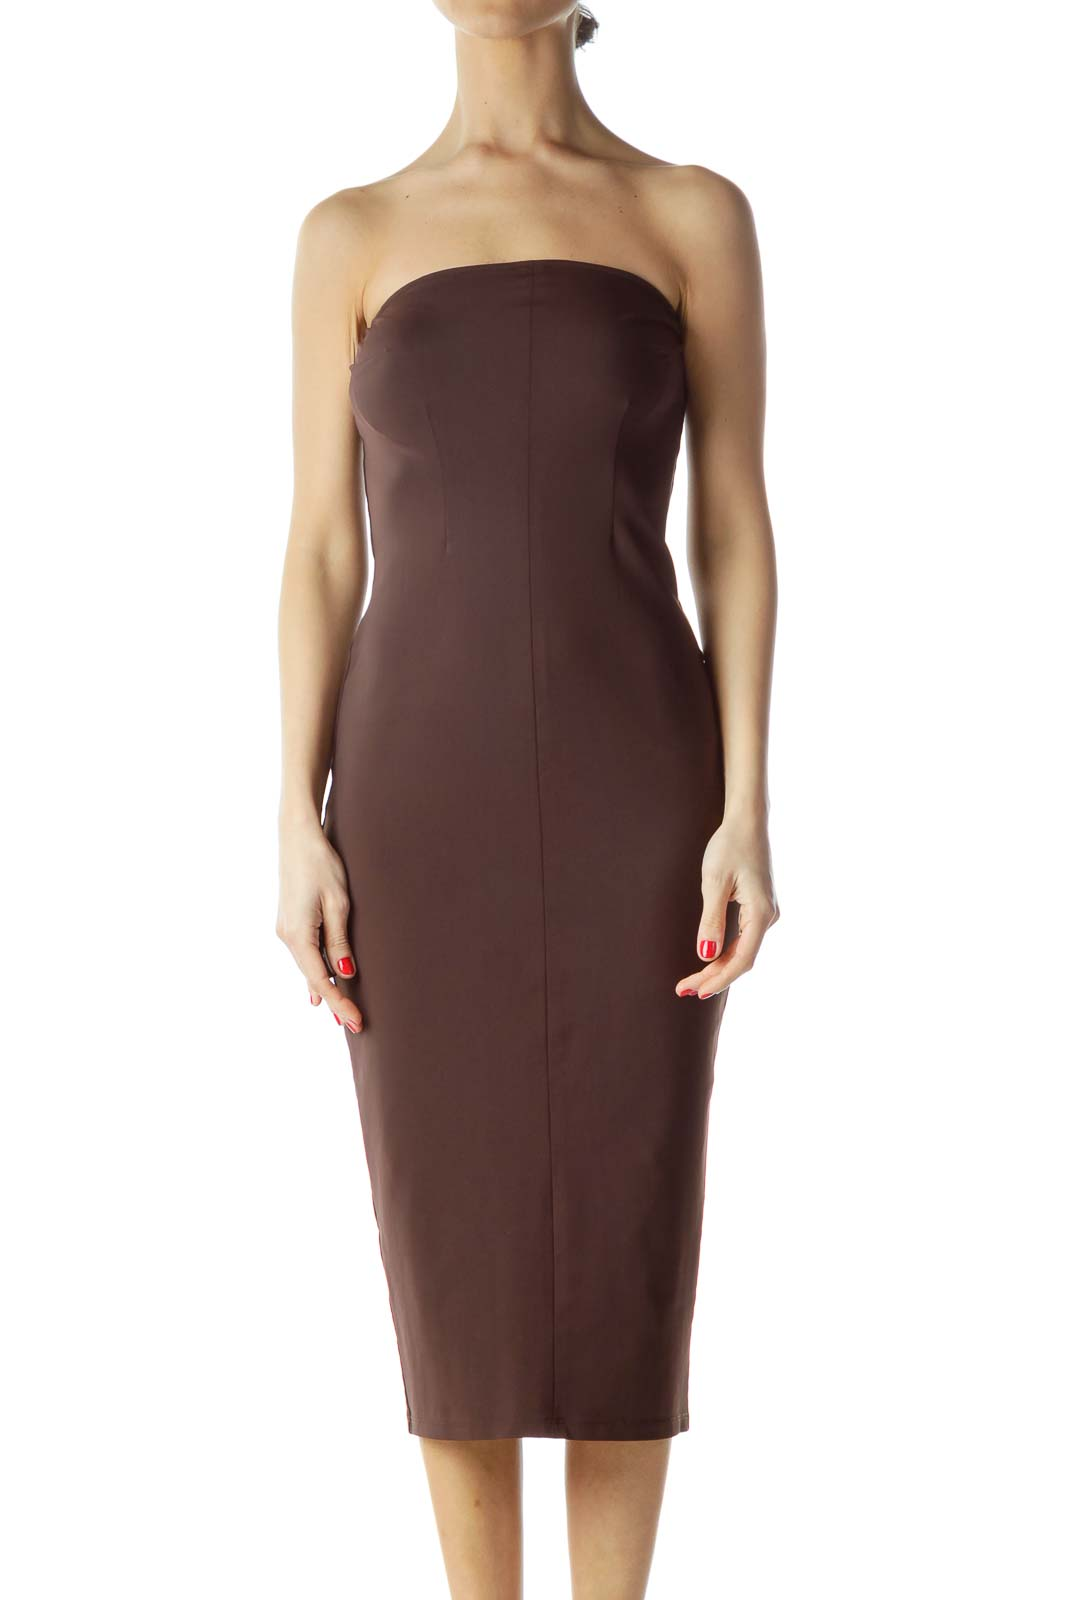 Brown Strapless Stretch Slim Cocktail Dress Front